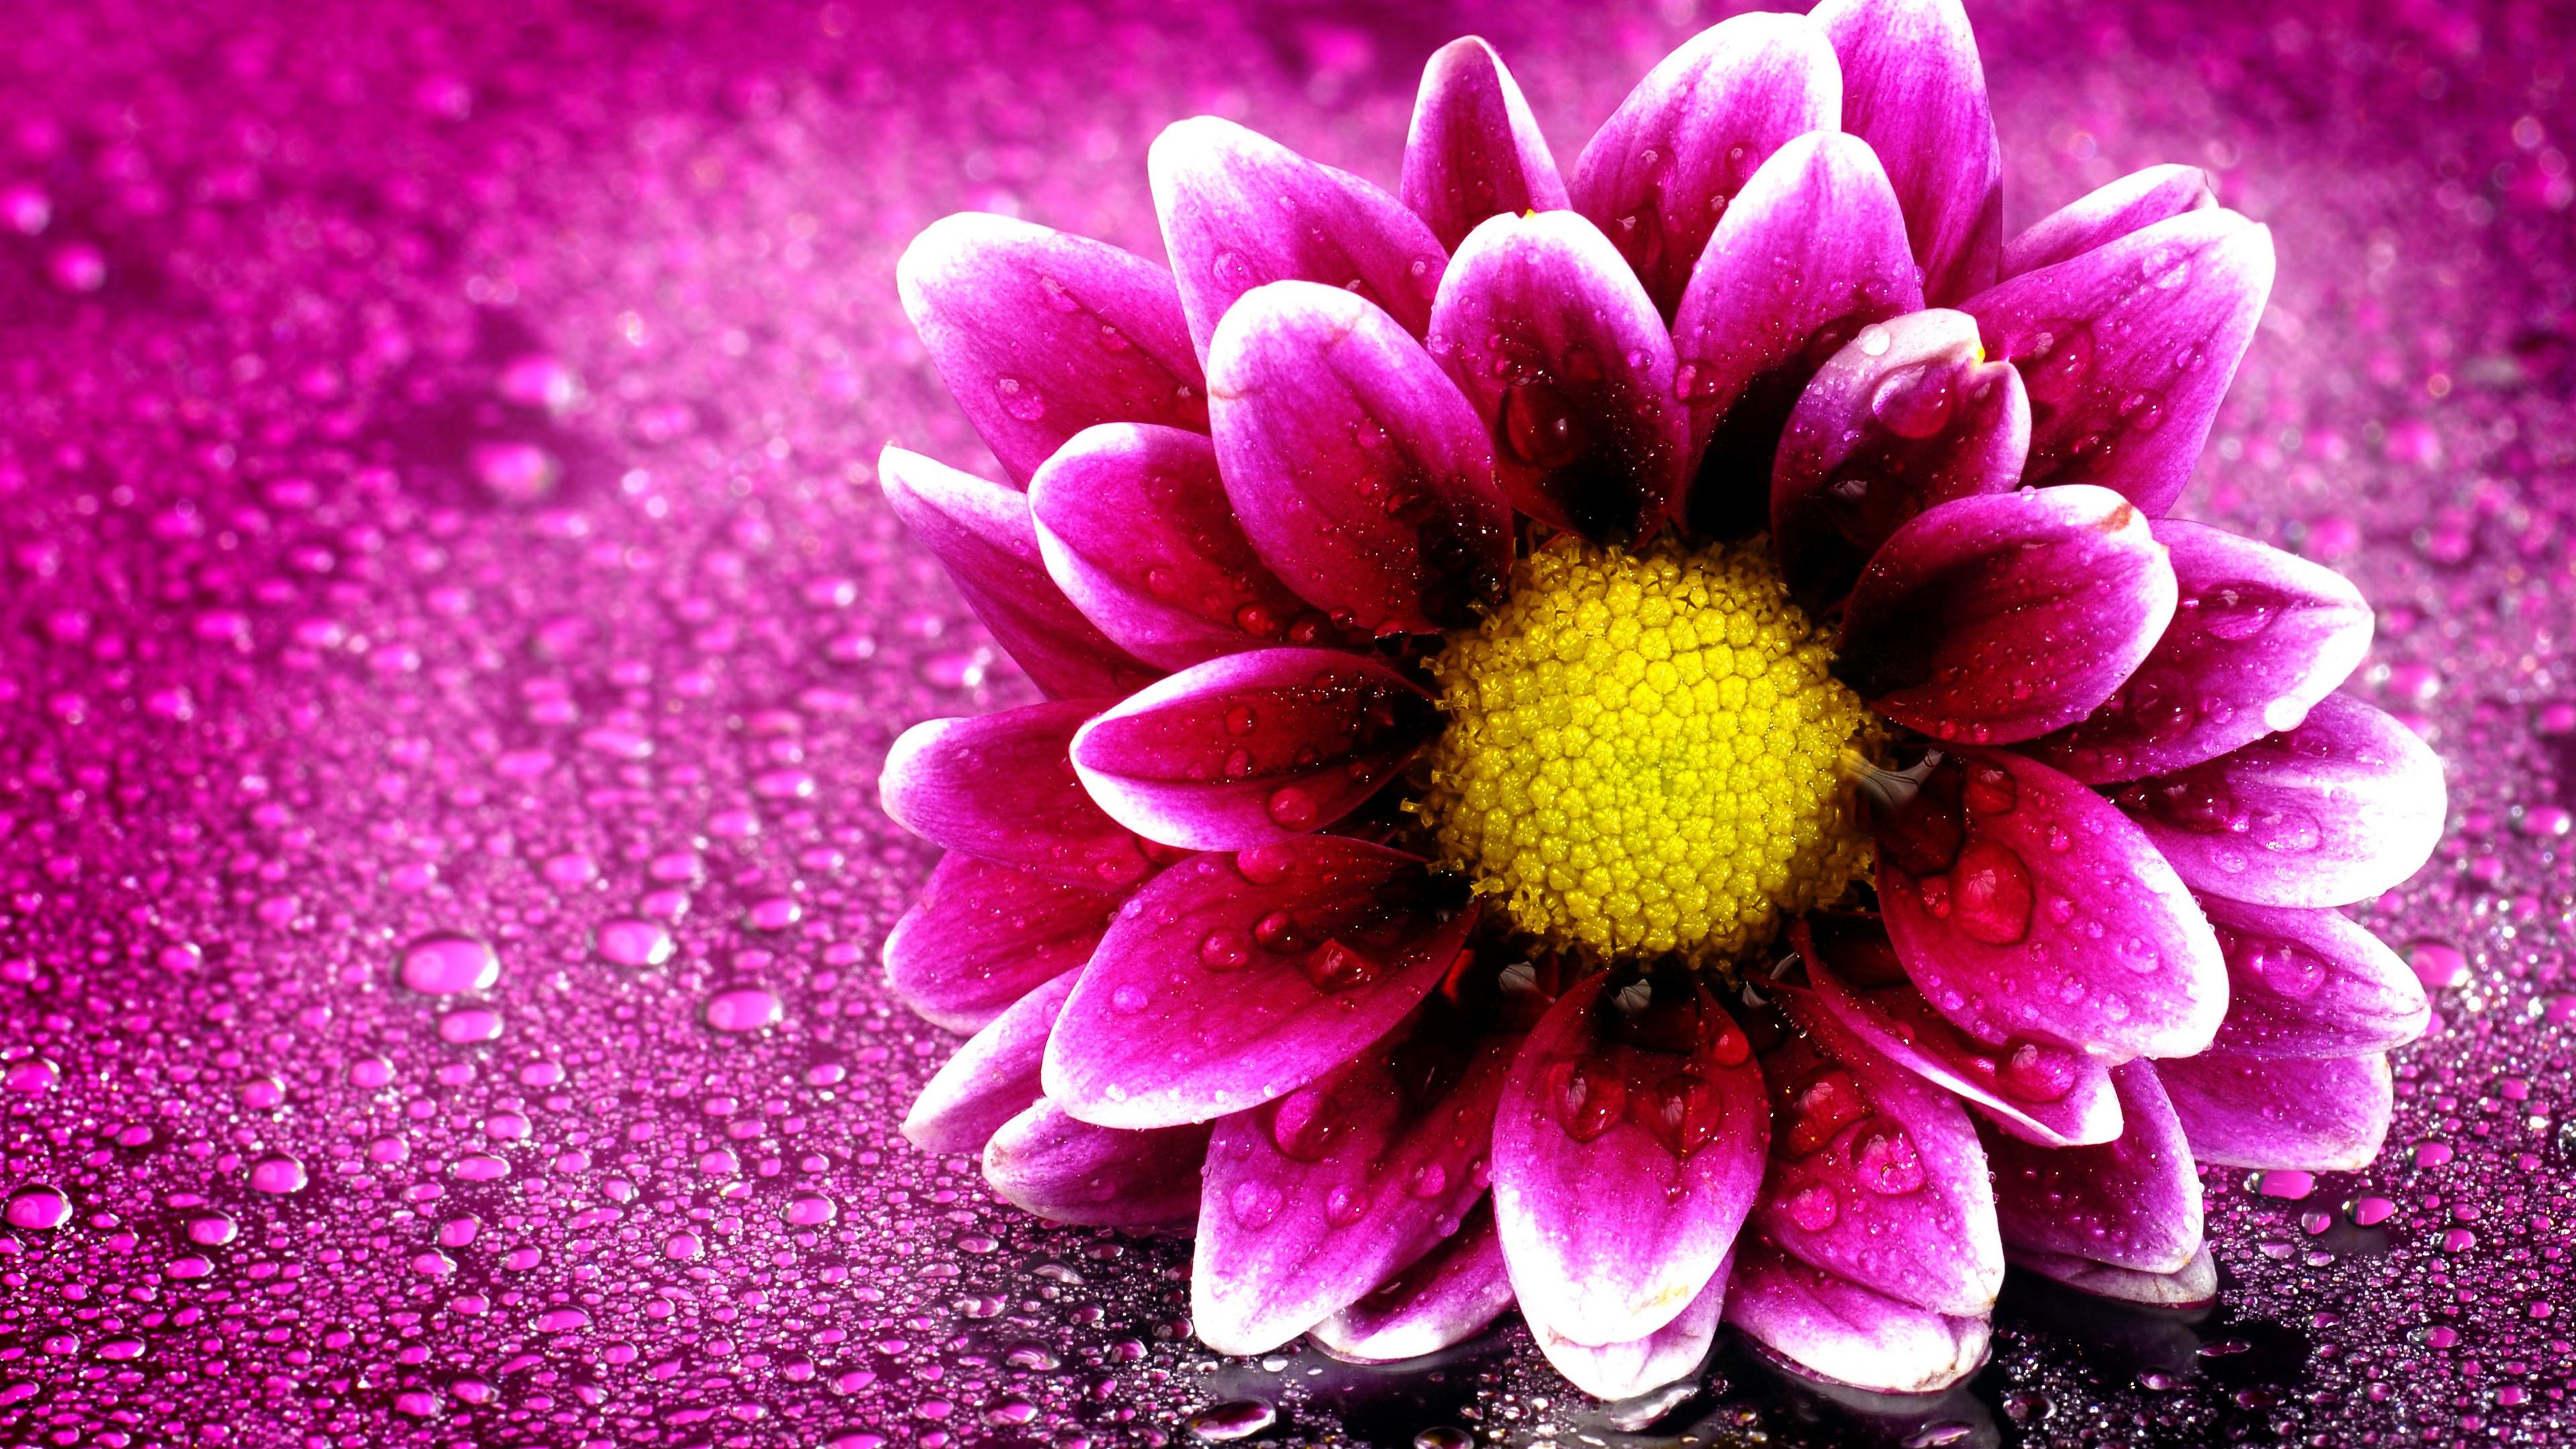 Flower Wallpaper Full Hd 3840x2160